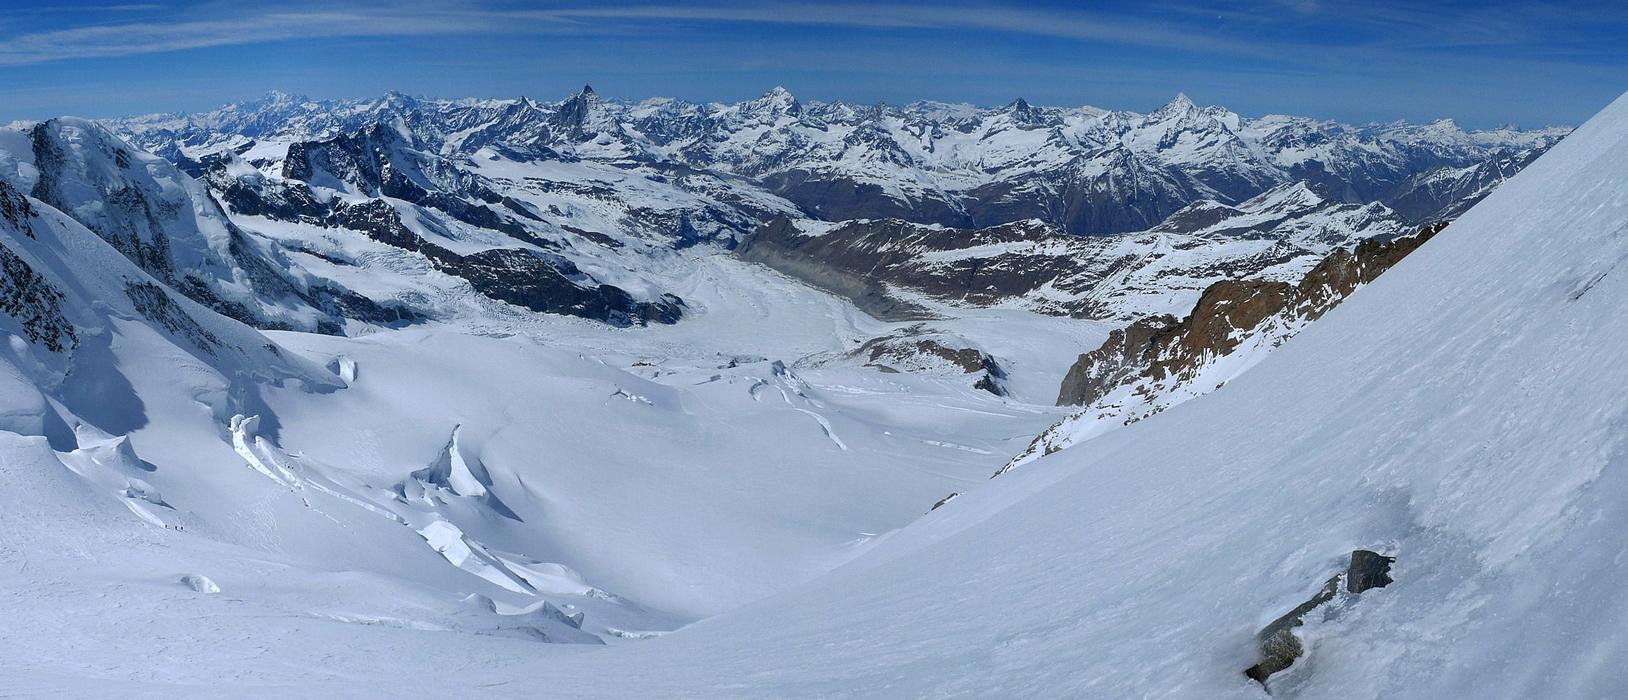 Nordend - Monte Rosa Walliser Alpen / Alpes valaisannes Švýcarsko panorama 40